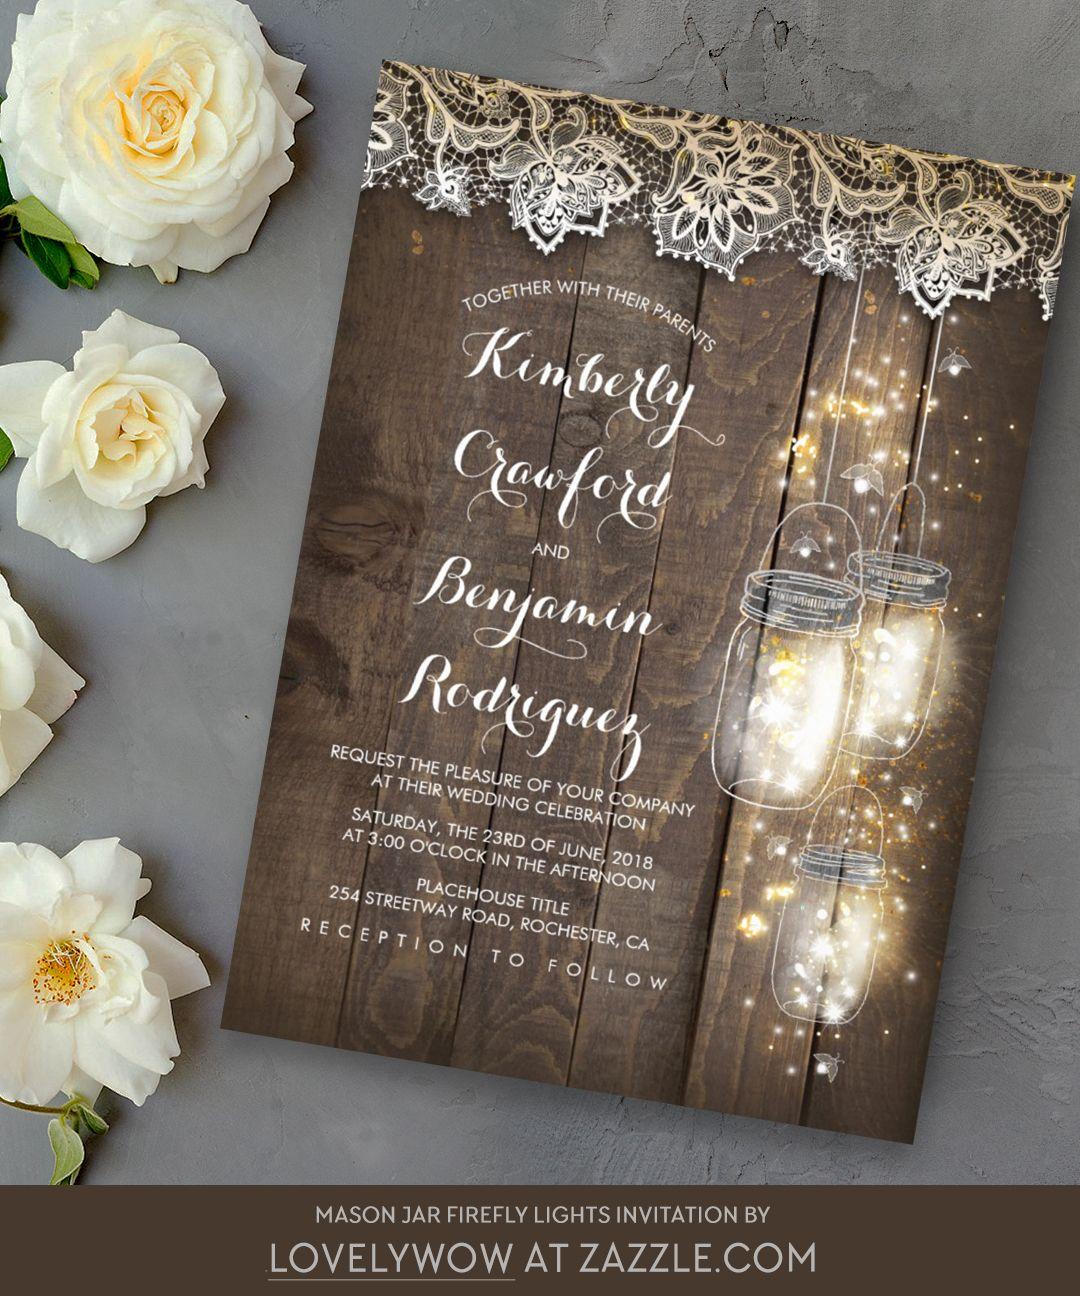 Mason Jar Firefly Lights, Lace, Wood Rustic Wedding Invitation ...